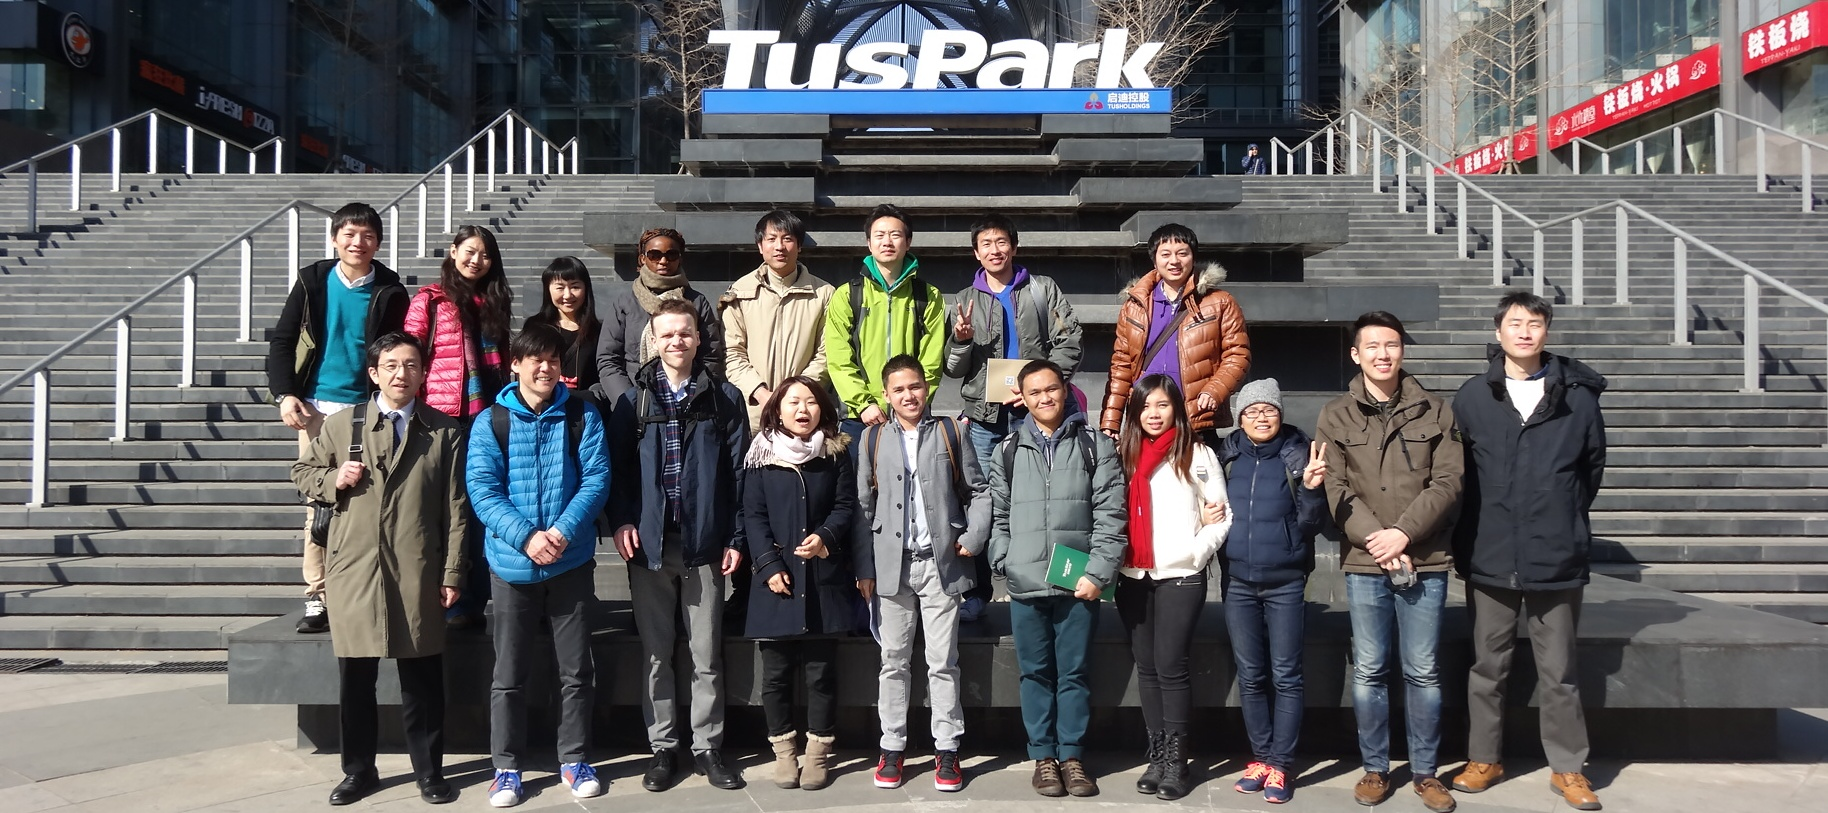 TSU Park